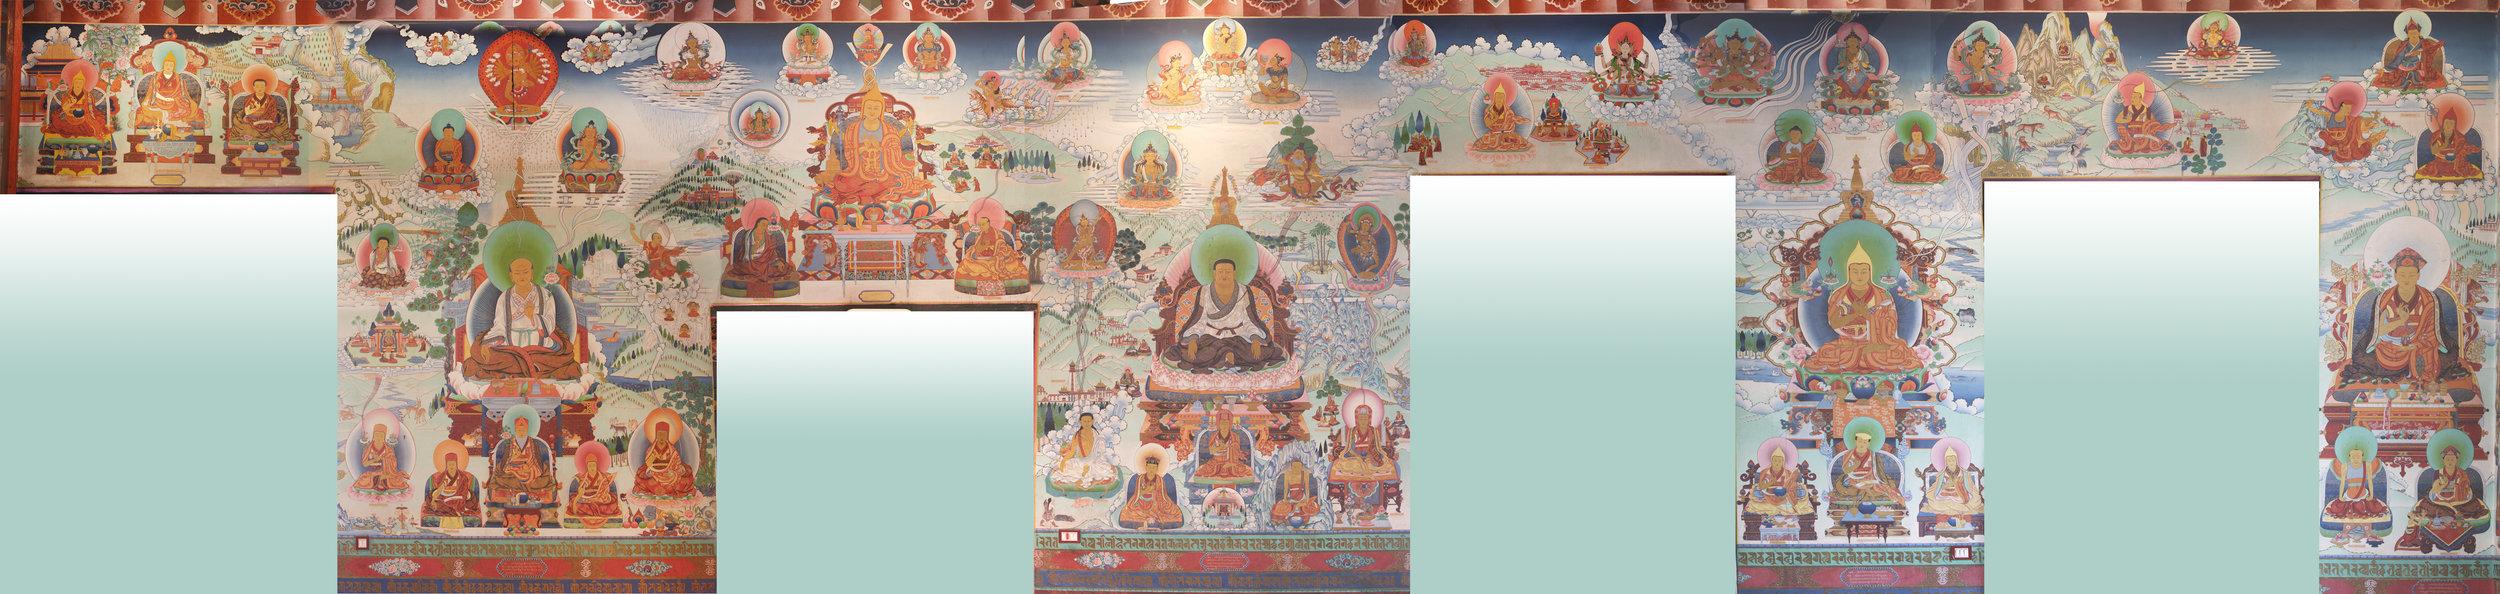 The North Wall features as central figures Sachen Kunga Wangpo, Marpa, Jowa Atisha, Je Tsongkhapa, and Shechen Gyaltsab Rinpoche. Smaller figures include Milarepa, Saraha, Tilopa, Gampopa, Jamgon Kongtrul Lodro Thaye, 16th Karmapa Rangjung Rigpe Dorje, Birupa, Nagarjuna , Loter Wangpo, and Asanga.